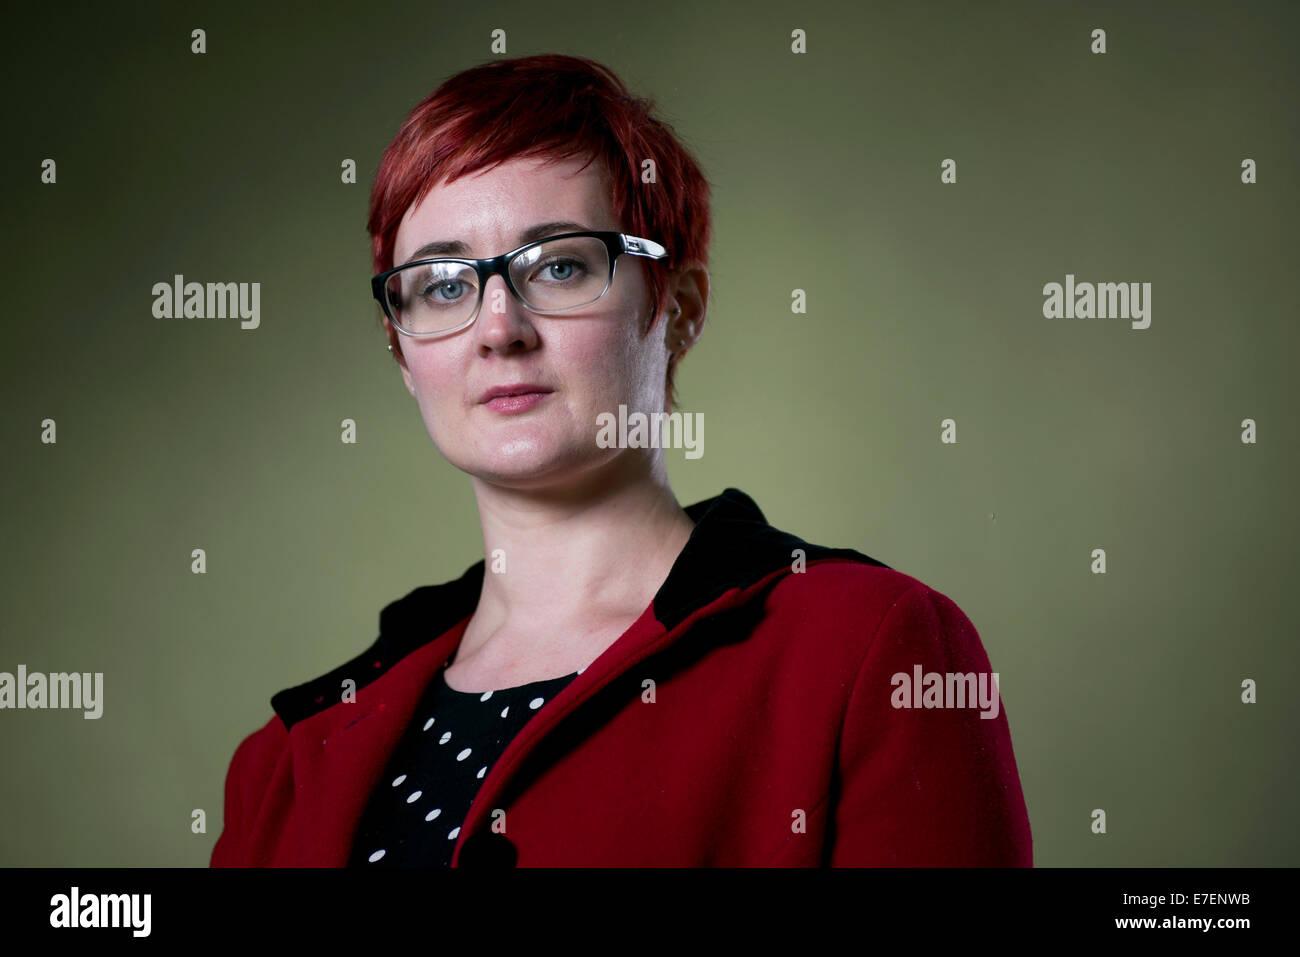 Novelist, short fiction writer, editor and teacher Kirsty Logan appears at the Edinburgh International Book Festival. - Stock Image